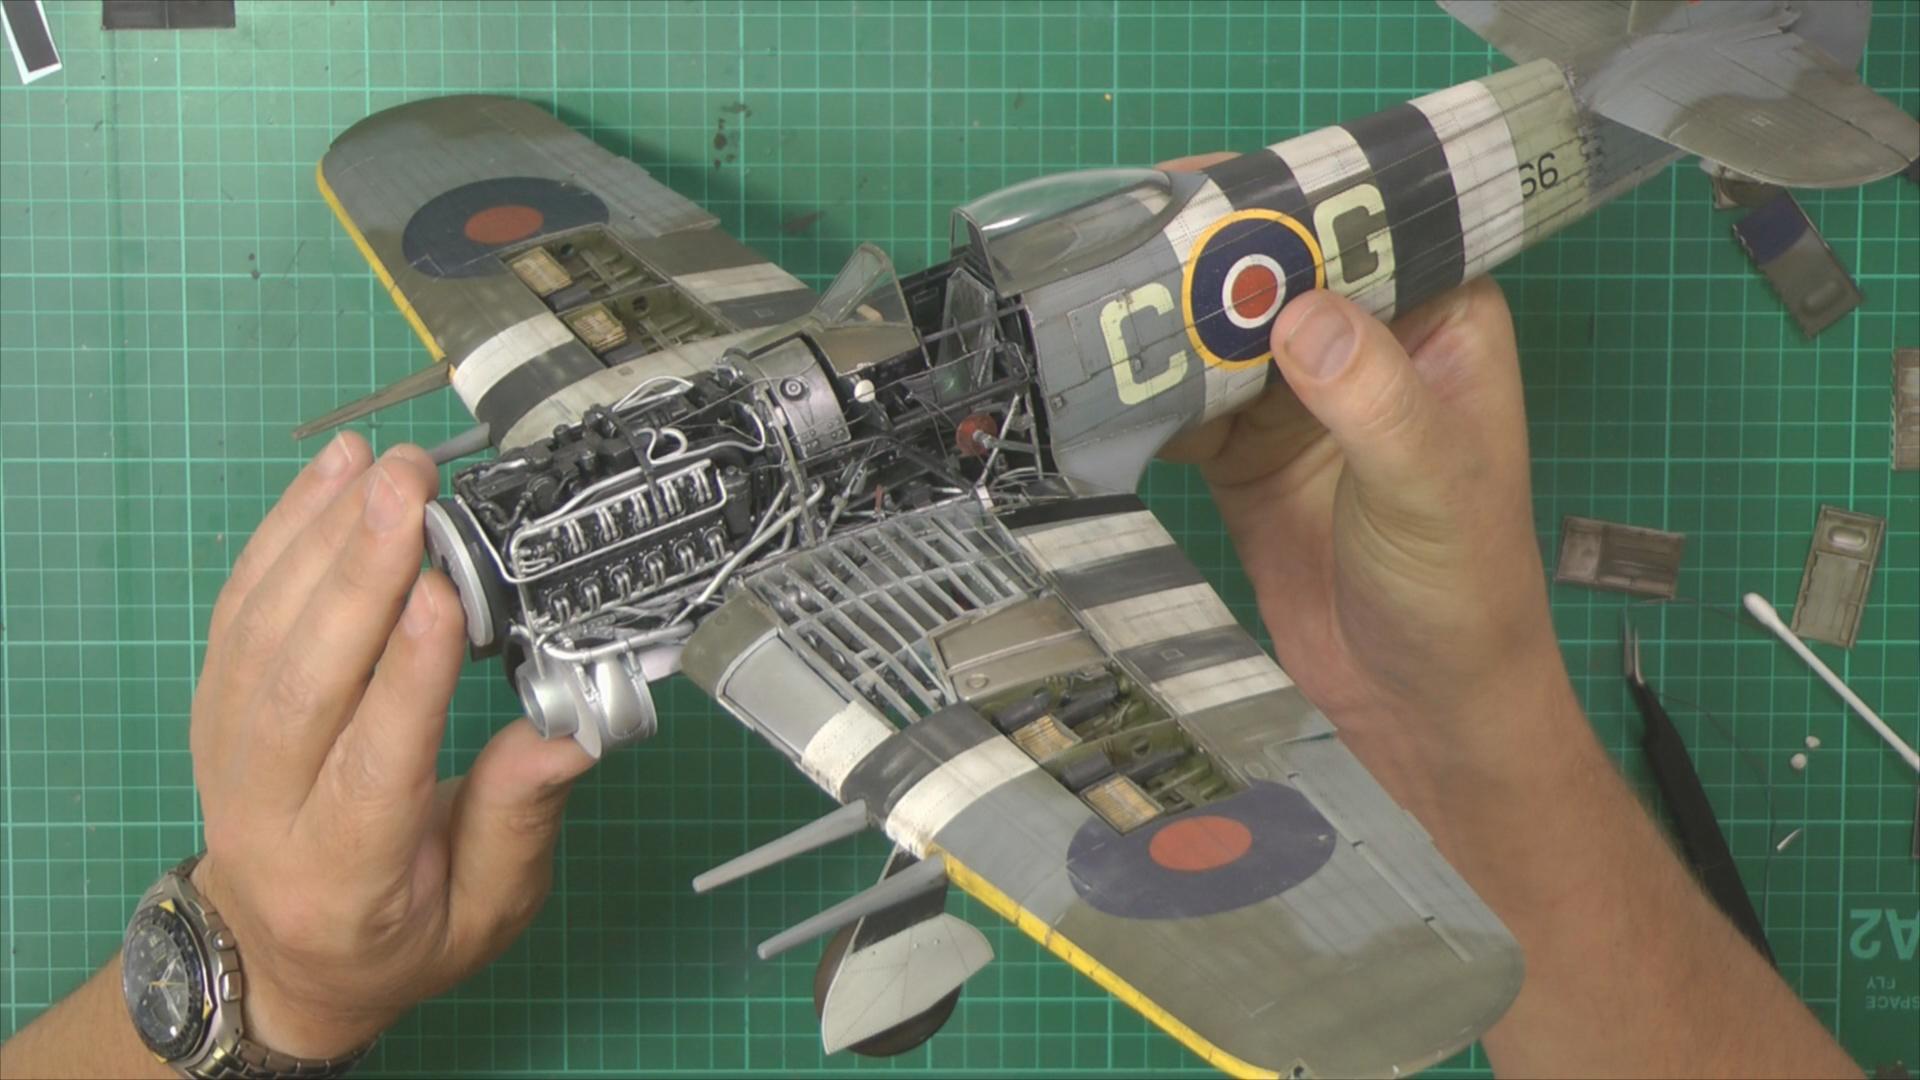 Hawker+Typhoon+Part+12+Pic+1.jpg